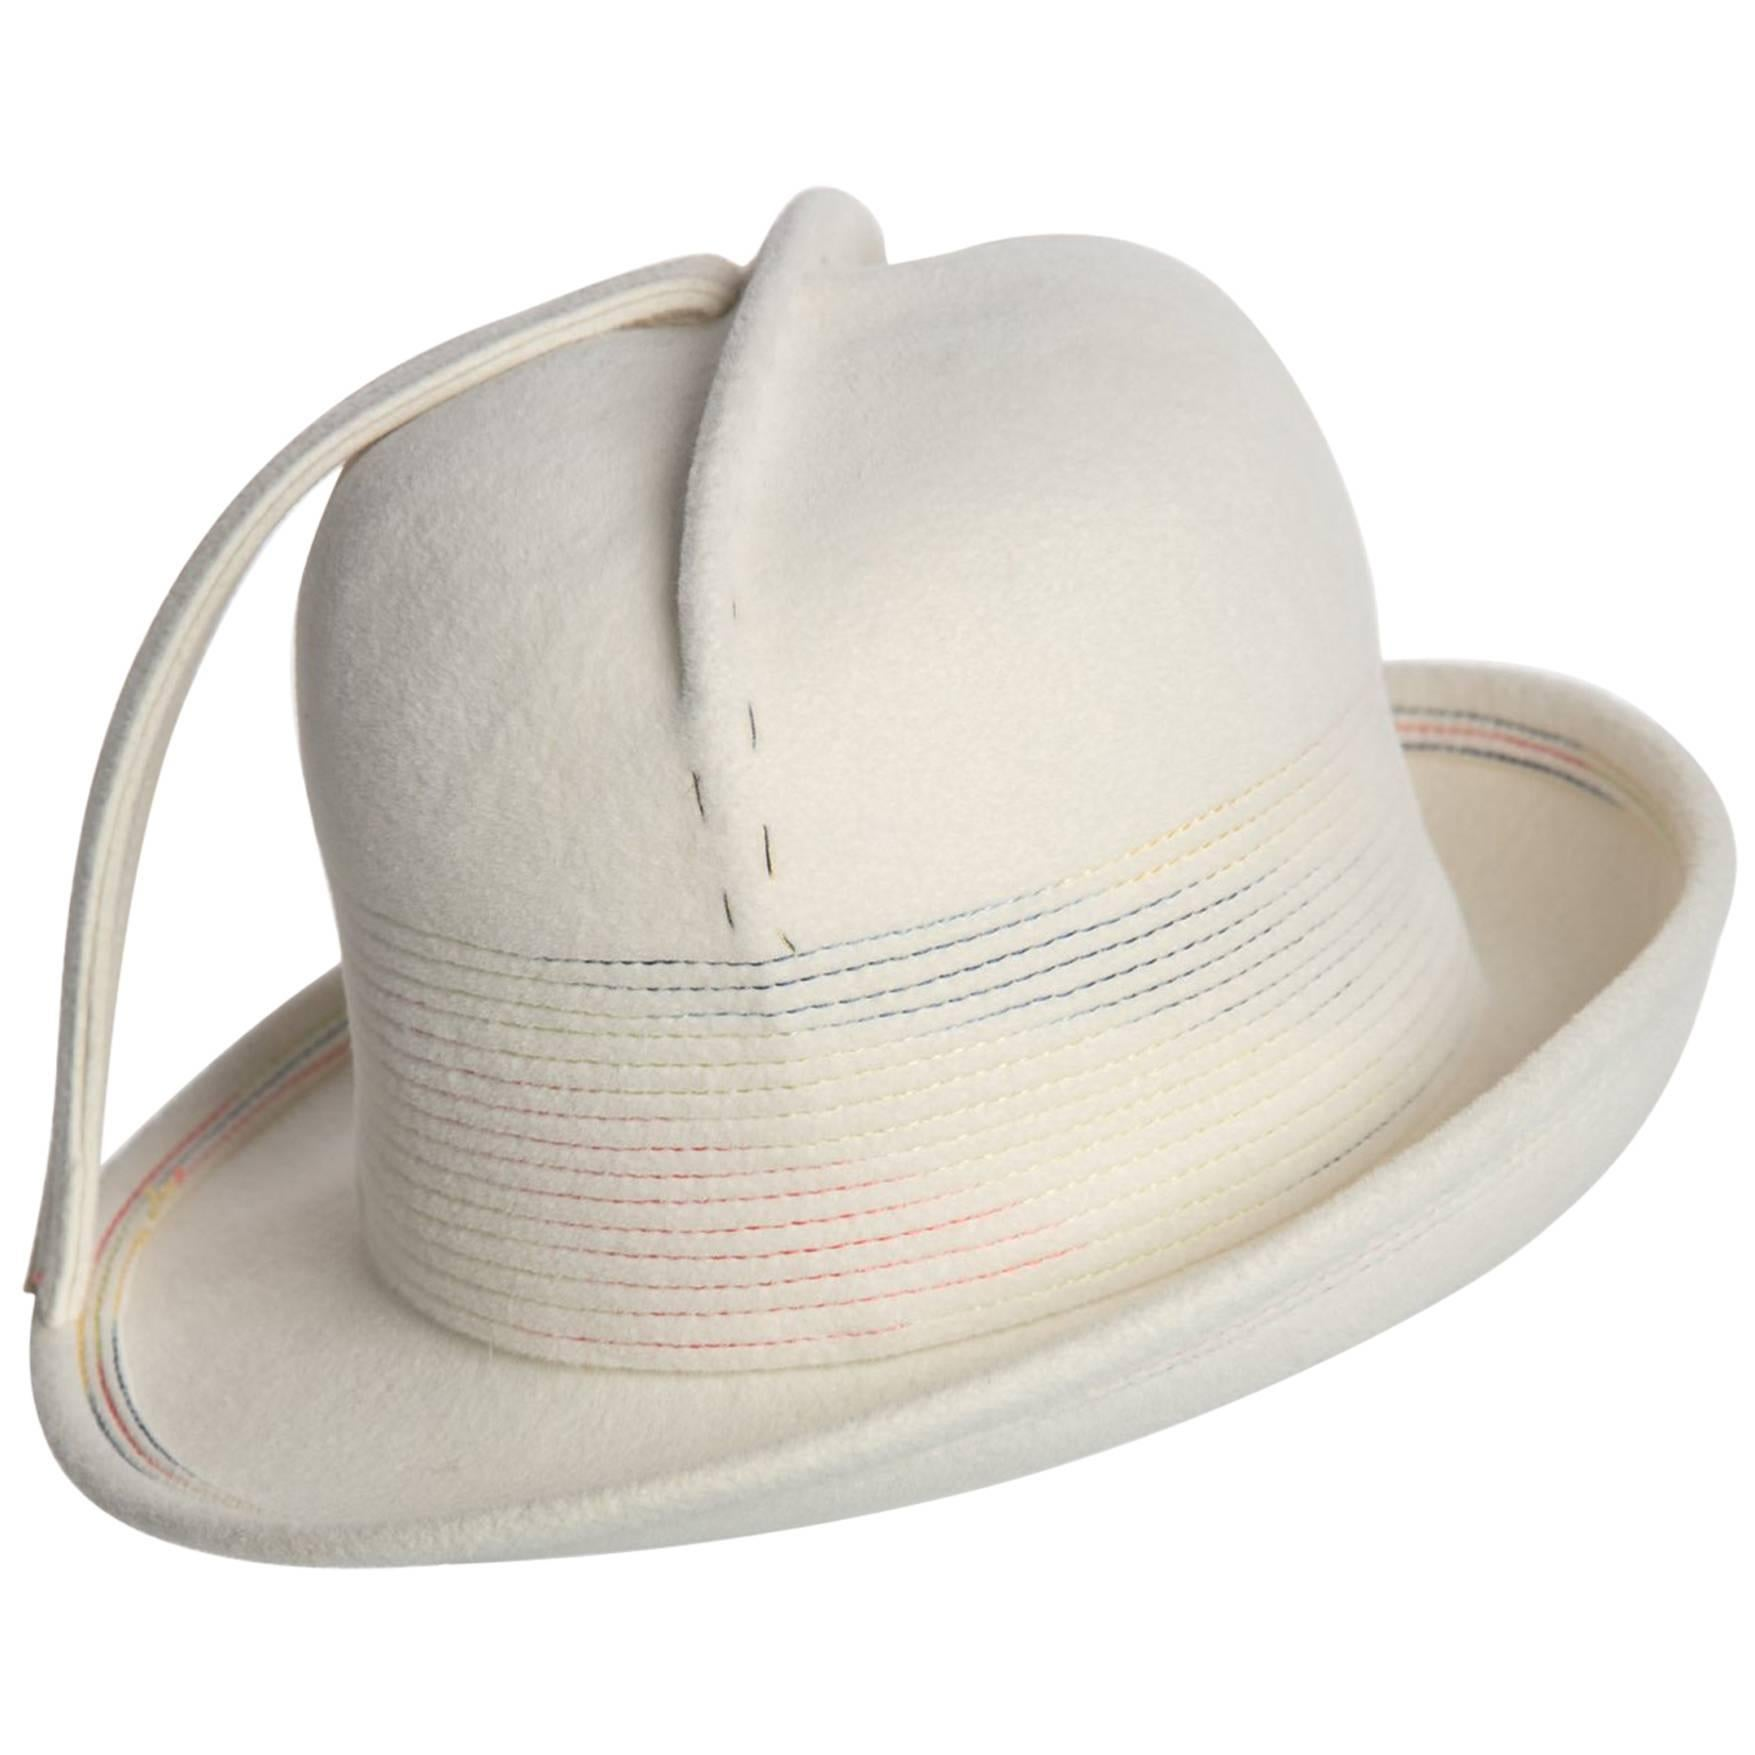 1960s Yves Saint Laurent YSL Sculpted Ivory Felt Fedora Hat